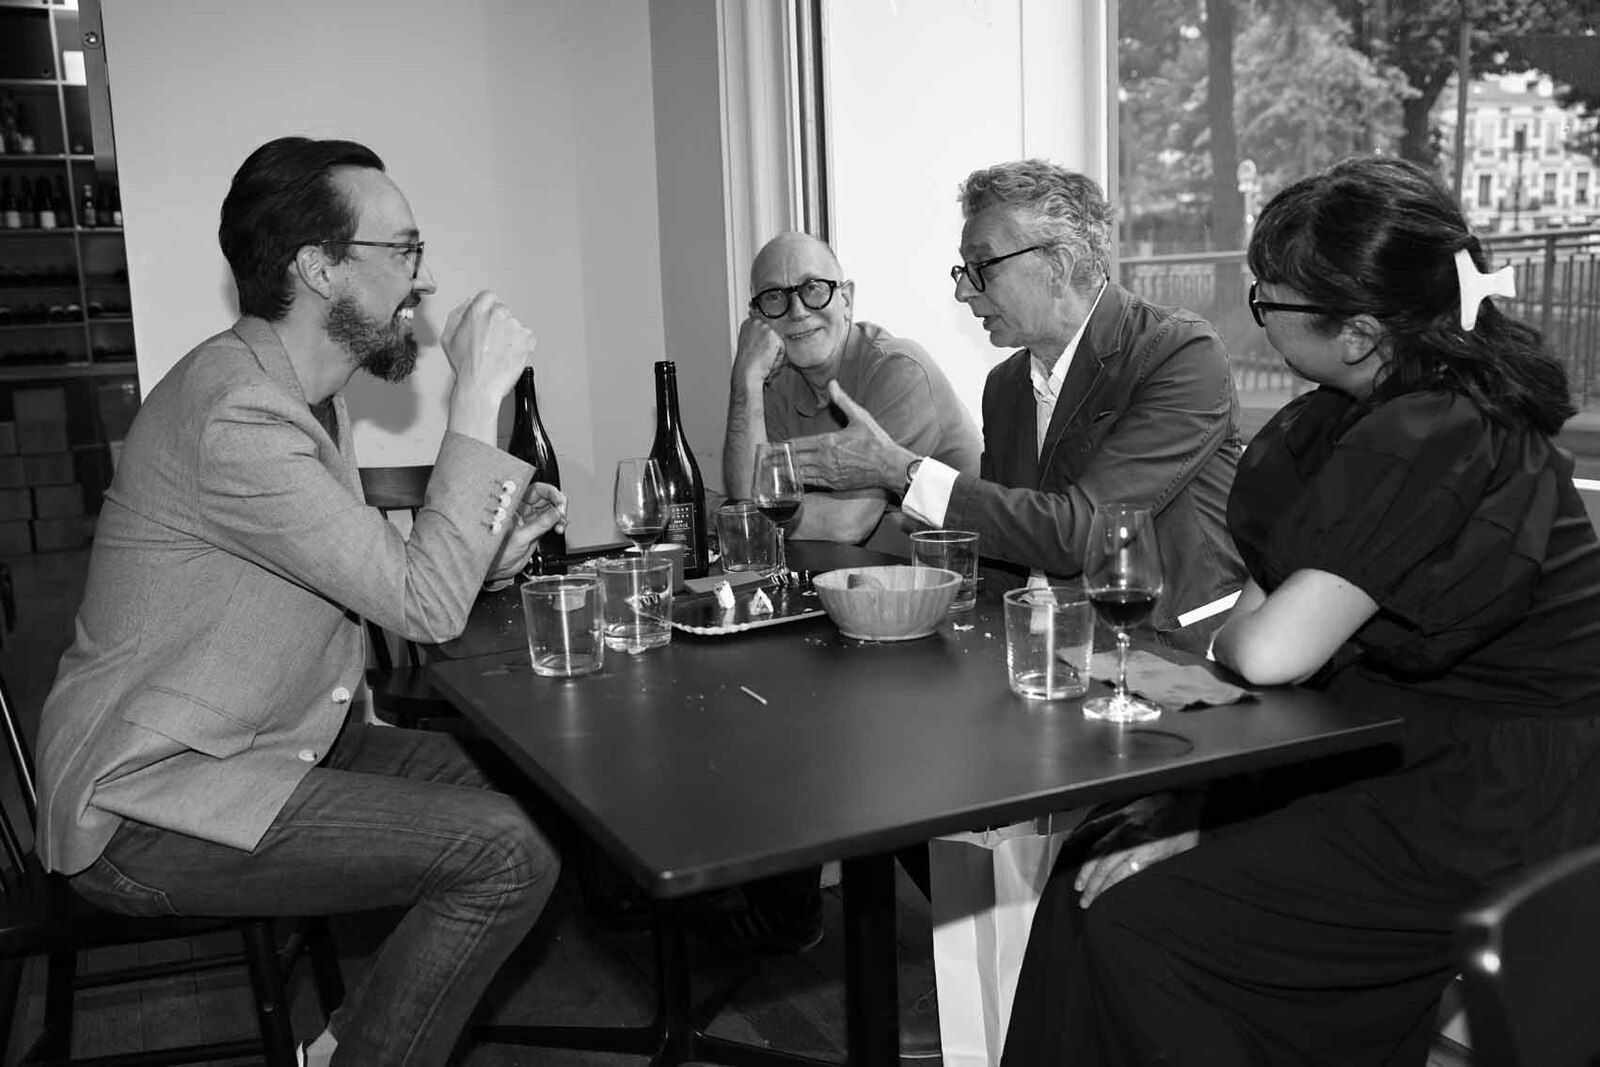 François Ceysson, Philippe Hertanu, Denis Castellas, Yayoï Castellas Gunji